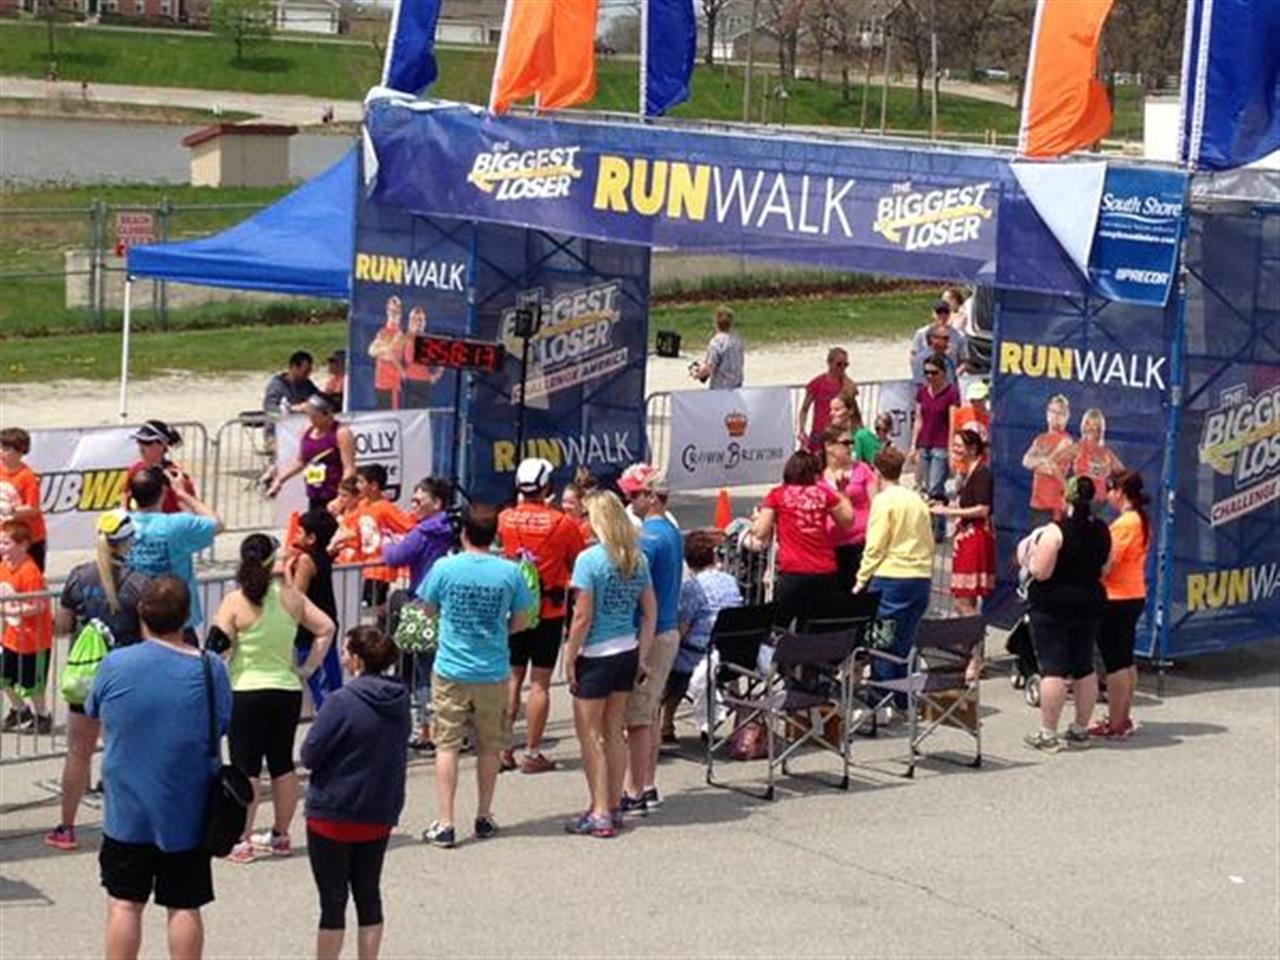 #LeadingRElocal, #Biggest Loser Run/Walk half Marathon / 5k